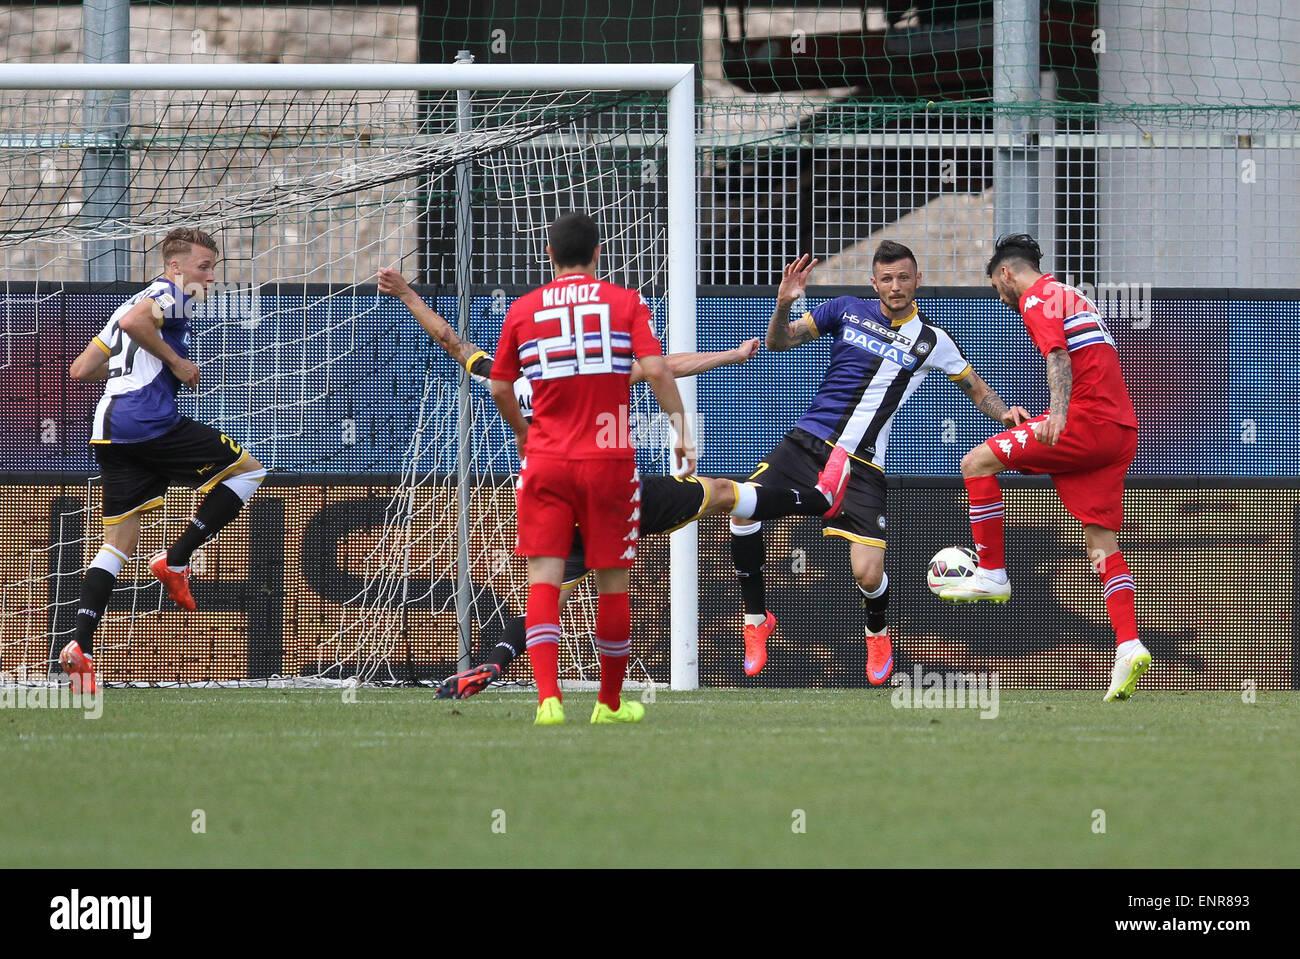 ITALY, Udine: Sampdoria's midfielder Roberto scoring goal 0-2 during the Italian Serie A football match between - Stock Image